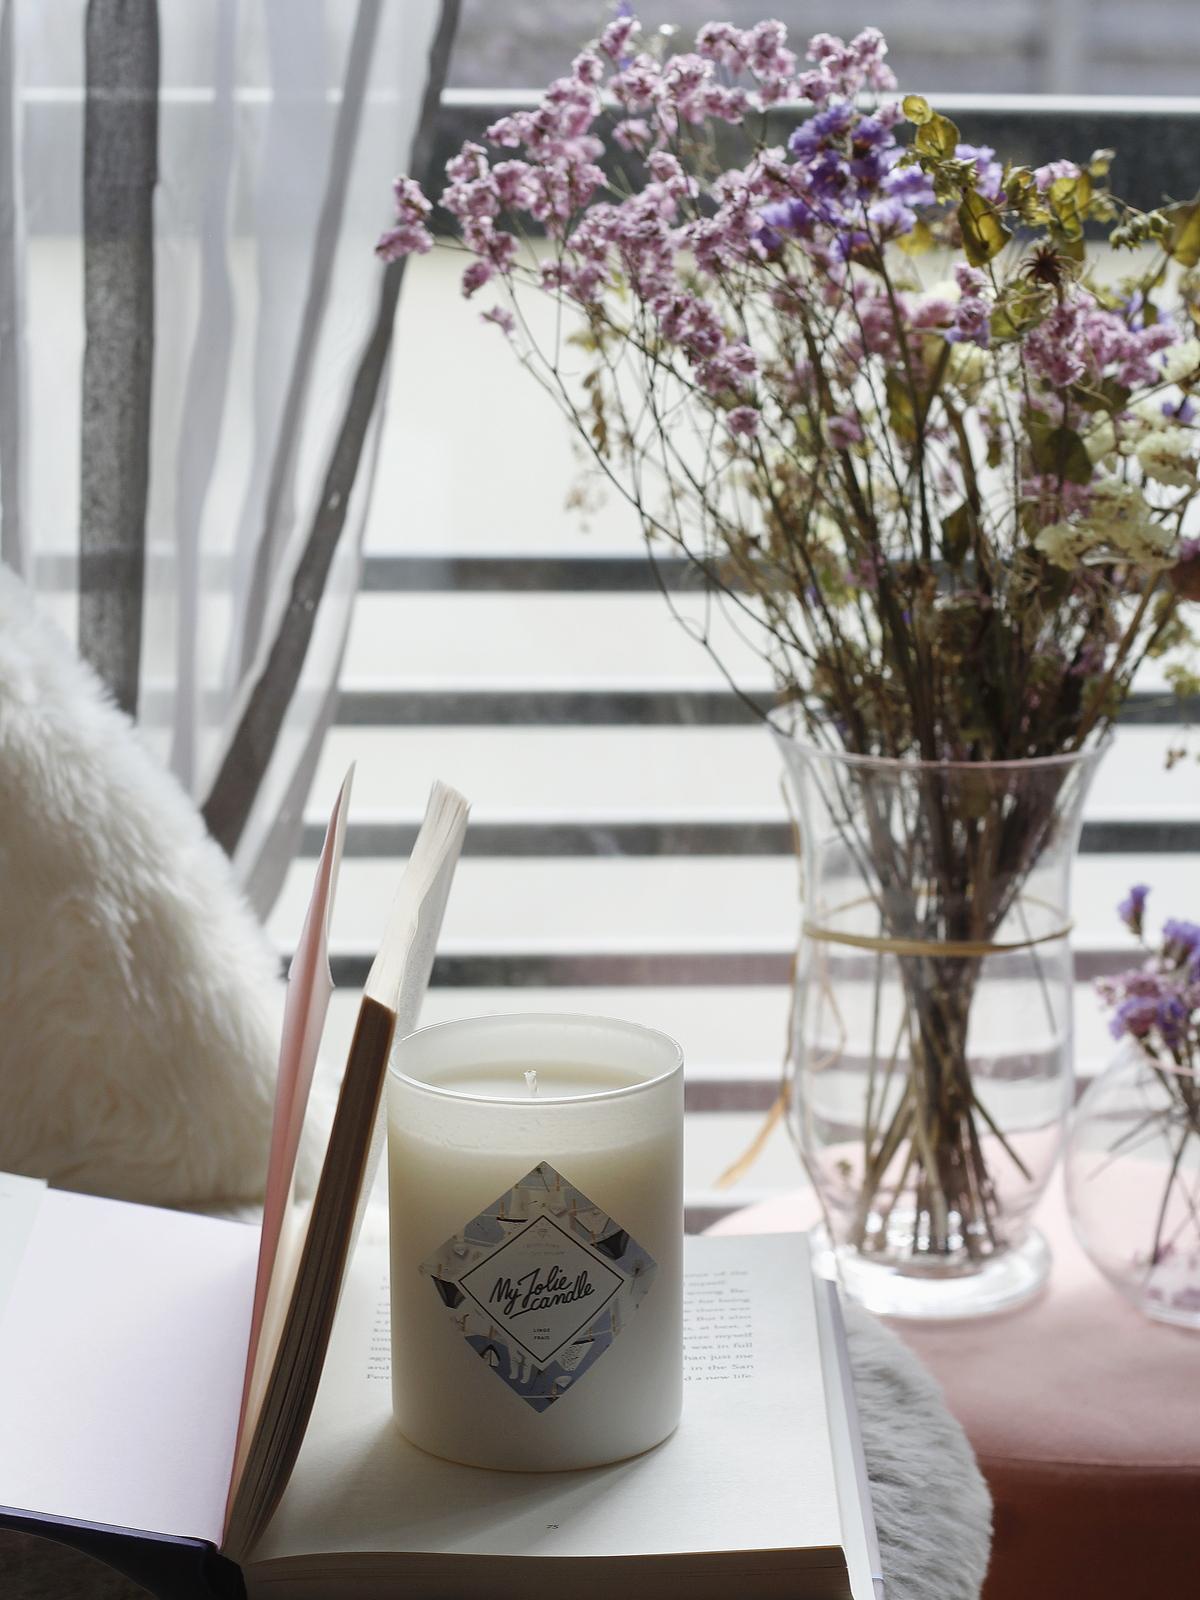 my jolie candle - bougie parfumée - bijoux